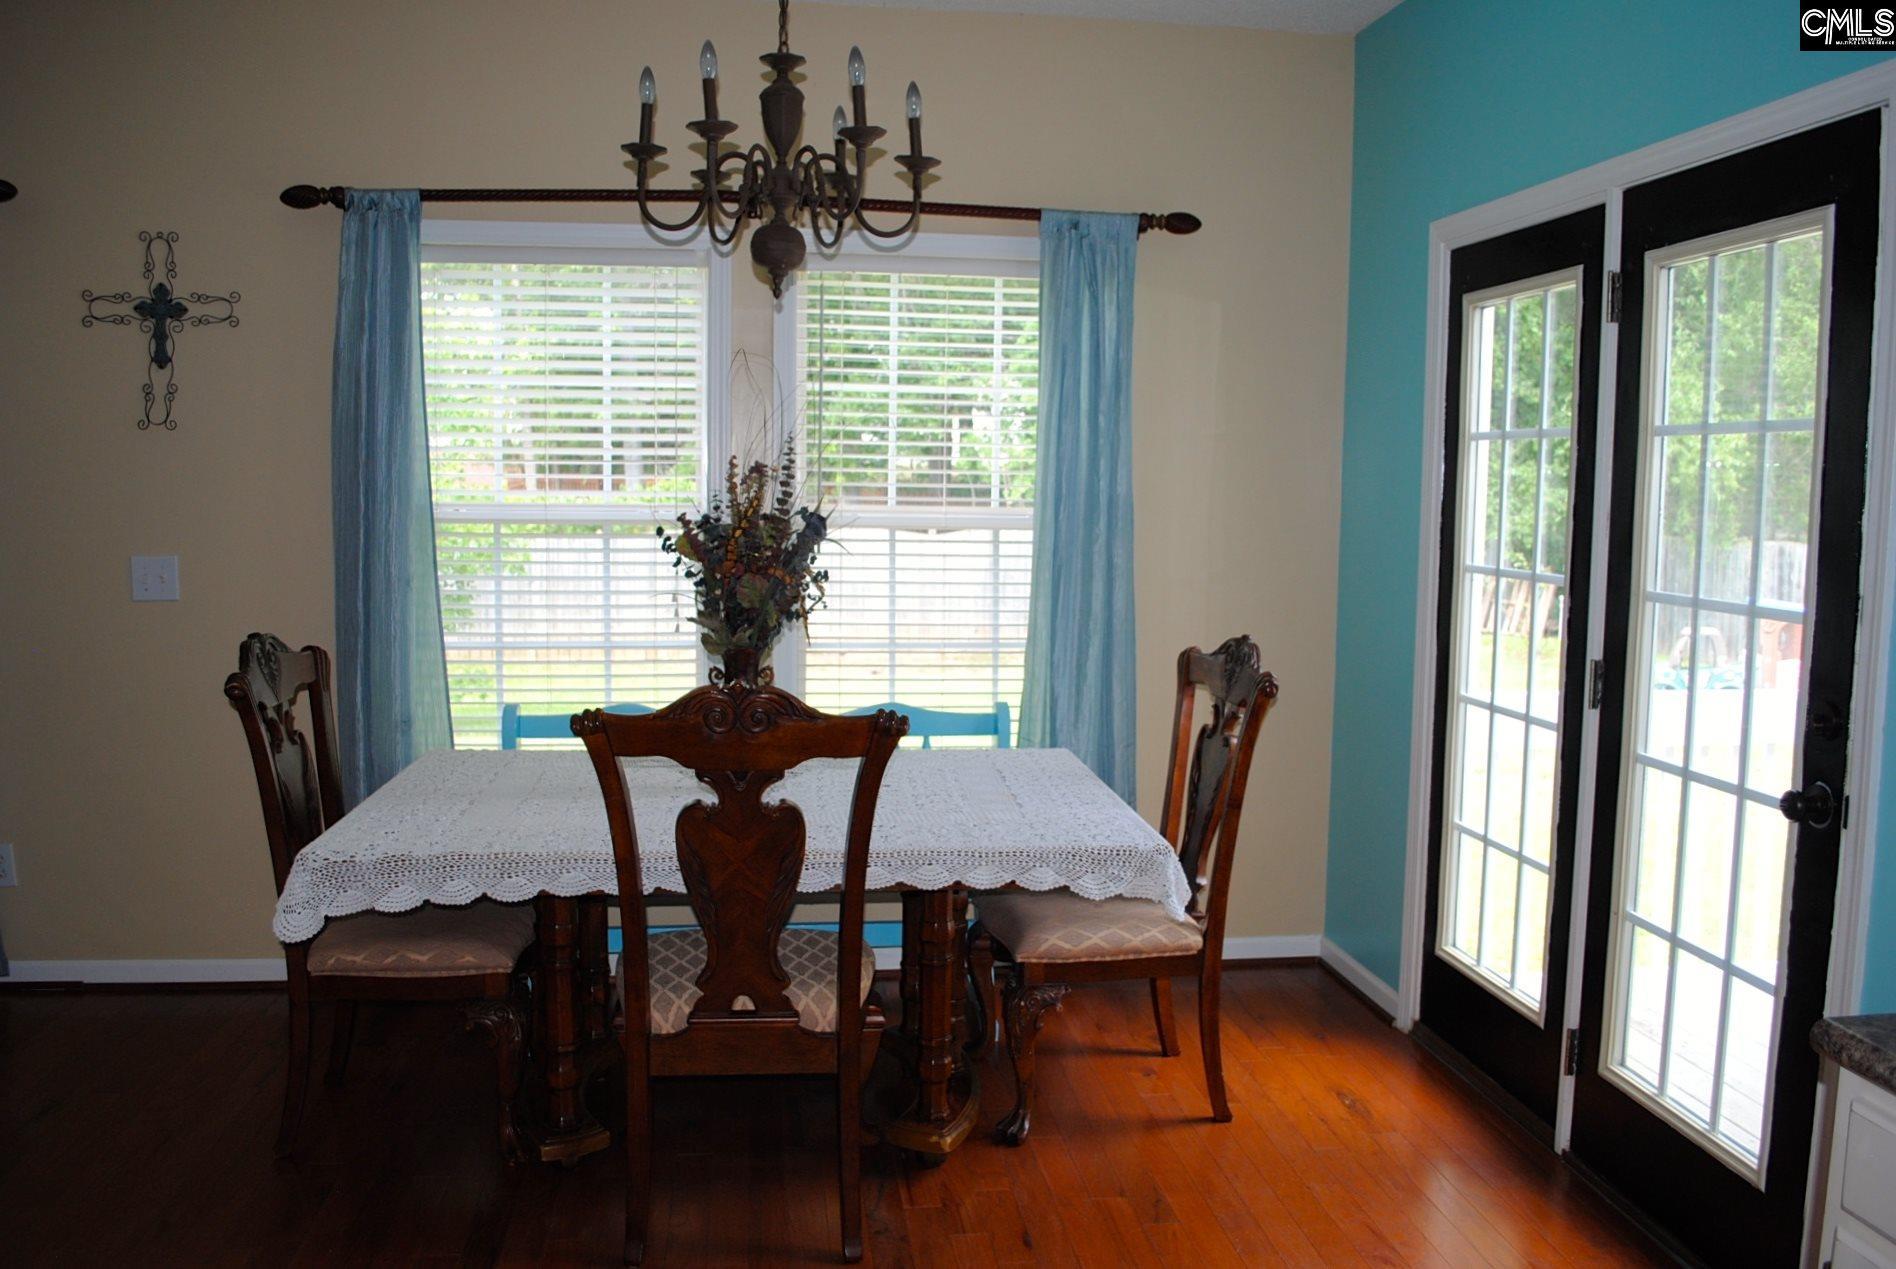 MLS# 452665 - 230 Delaine Woods, Irmo, South Carolina for $189,000